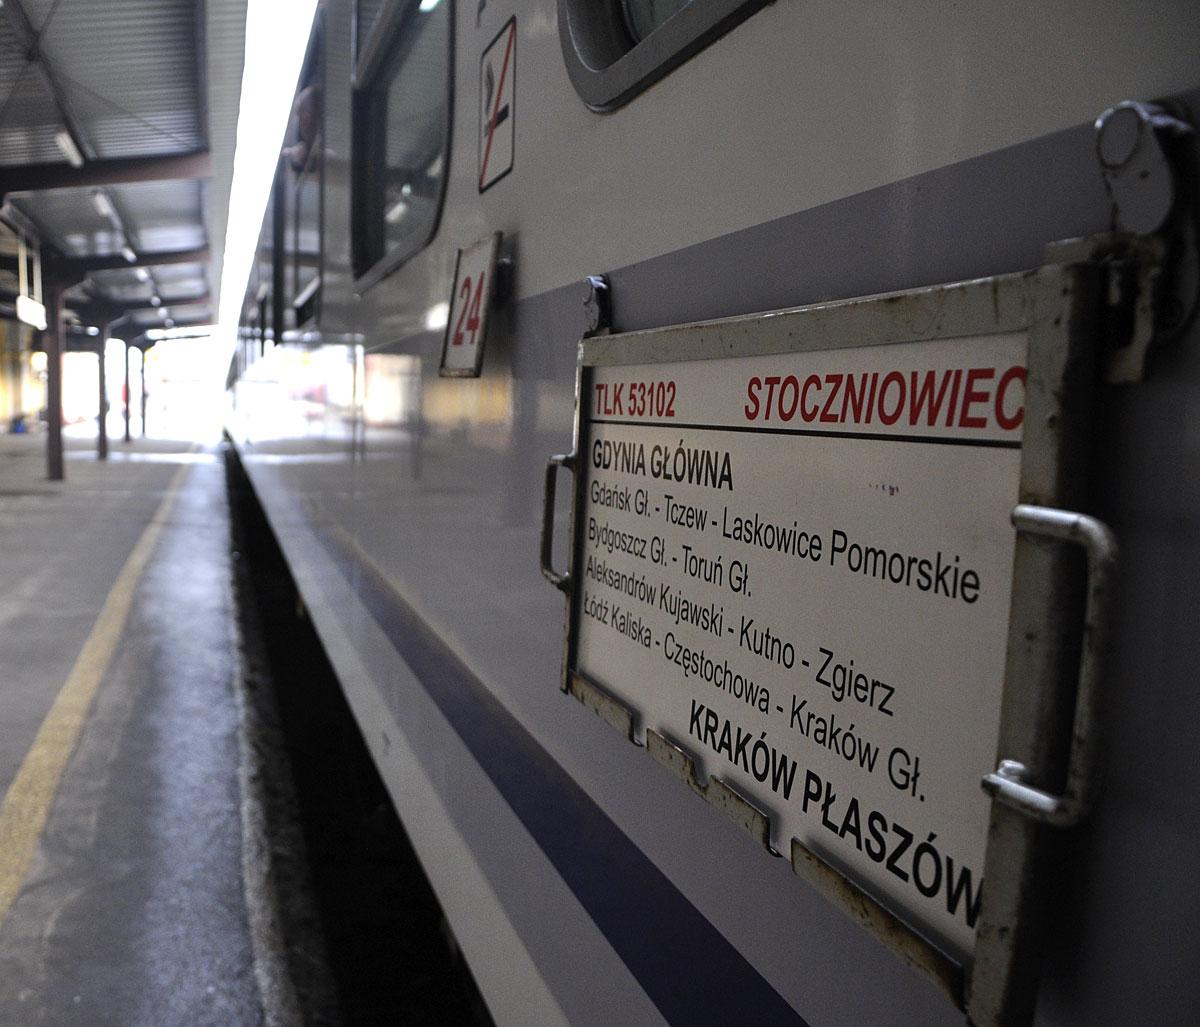 An InterCity train at the platform-Szymon Peplinski photo